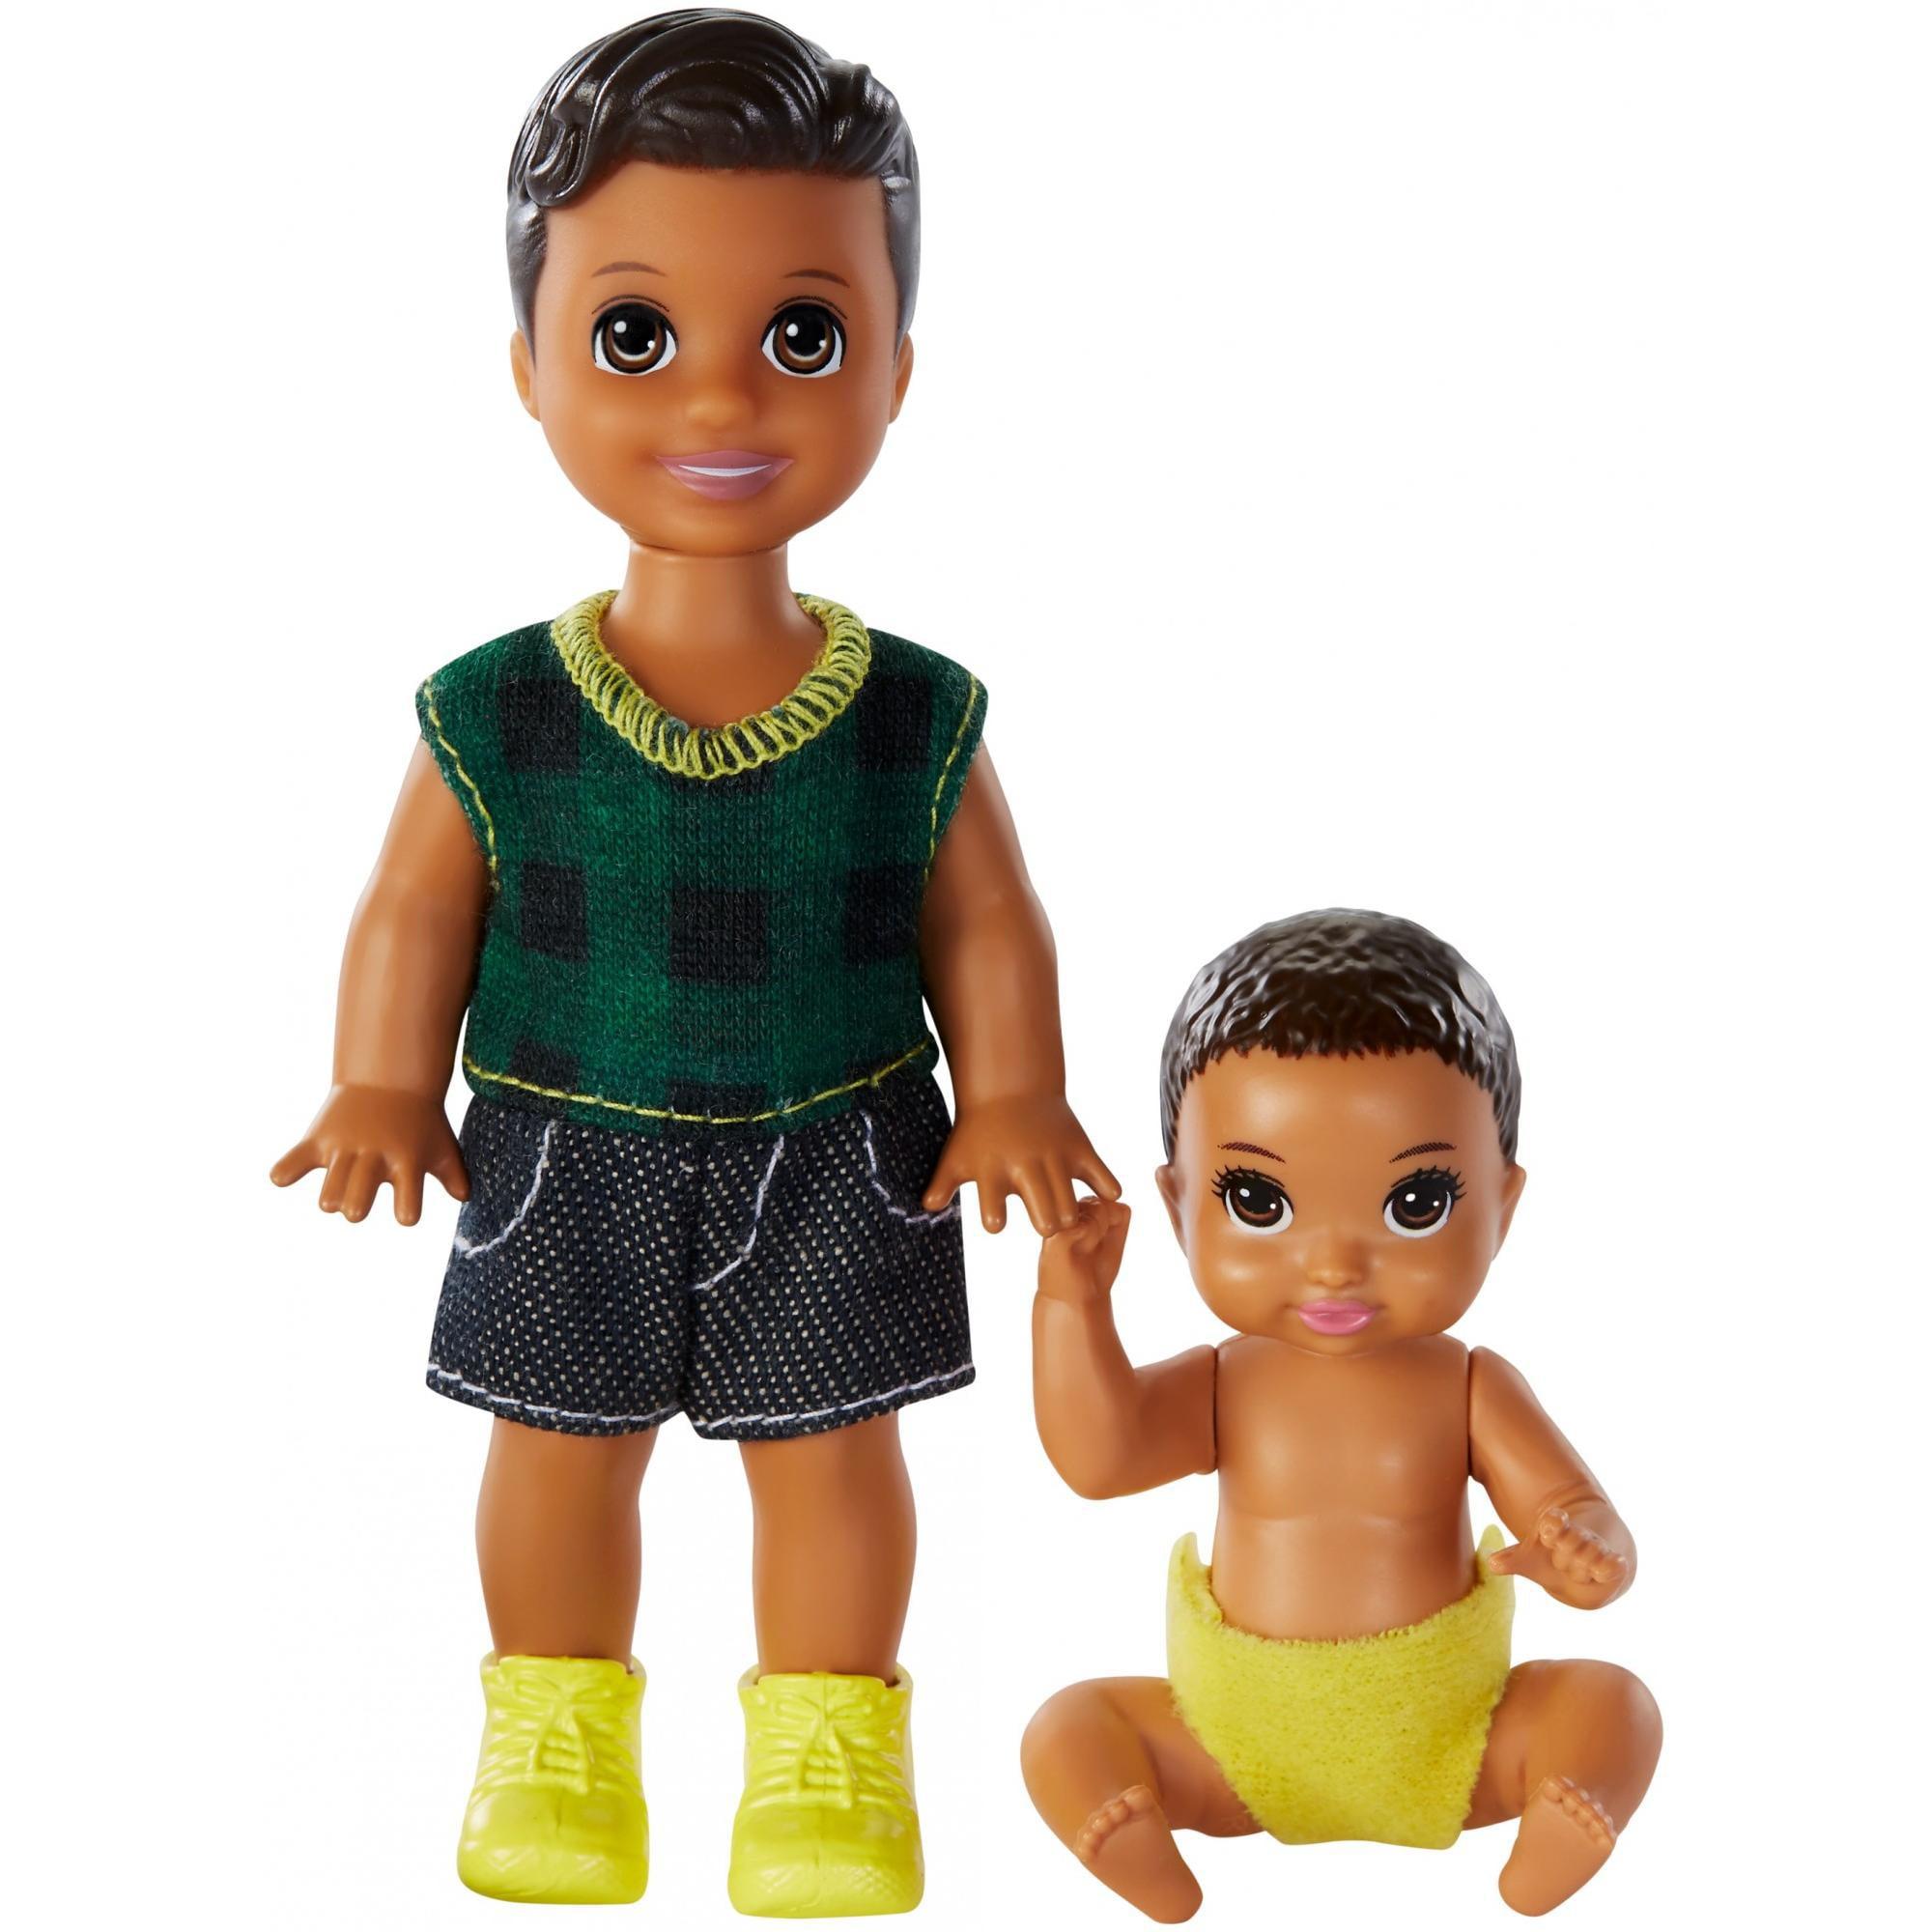 Barbie Skipper Babysitters Inc Dolls 2